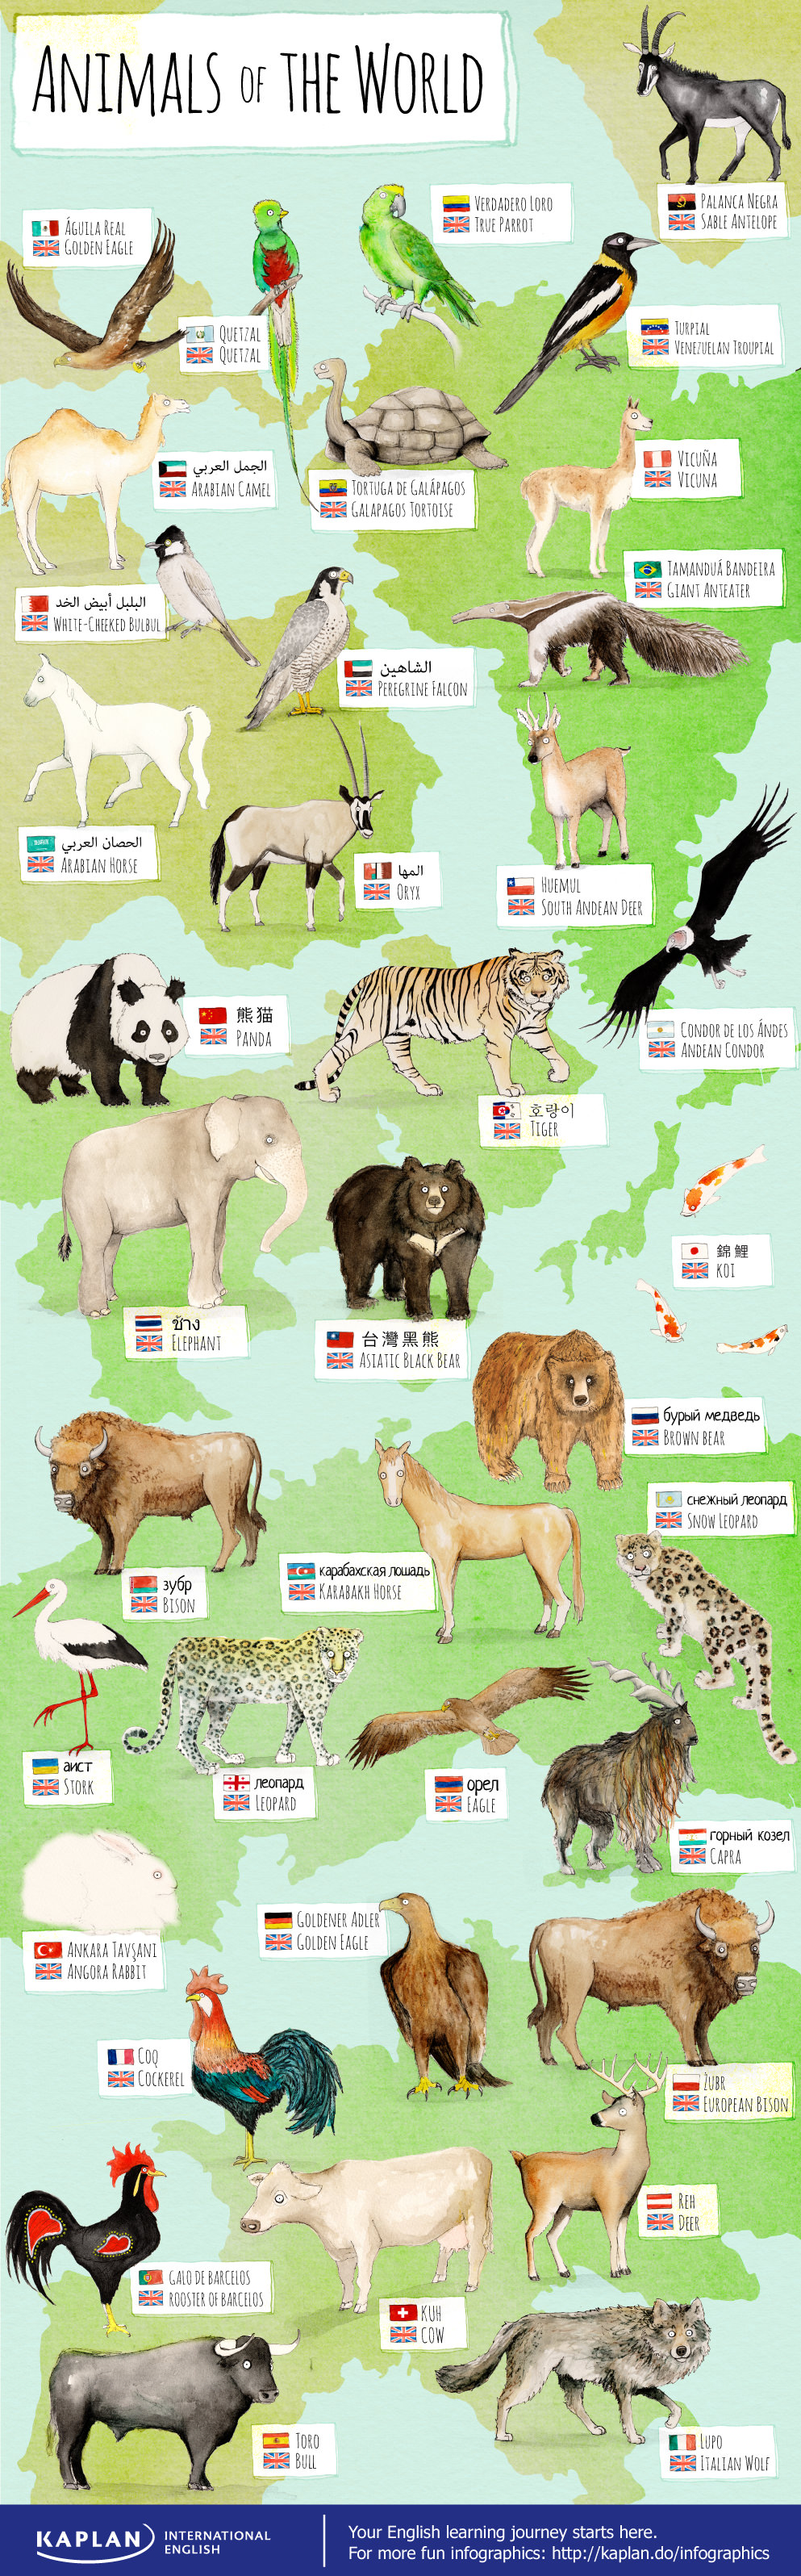 Learn World Animals In English Vocabulario En Ingles Educacion Aprender Ingles